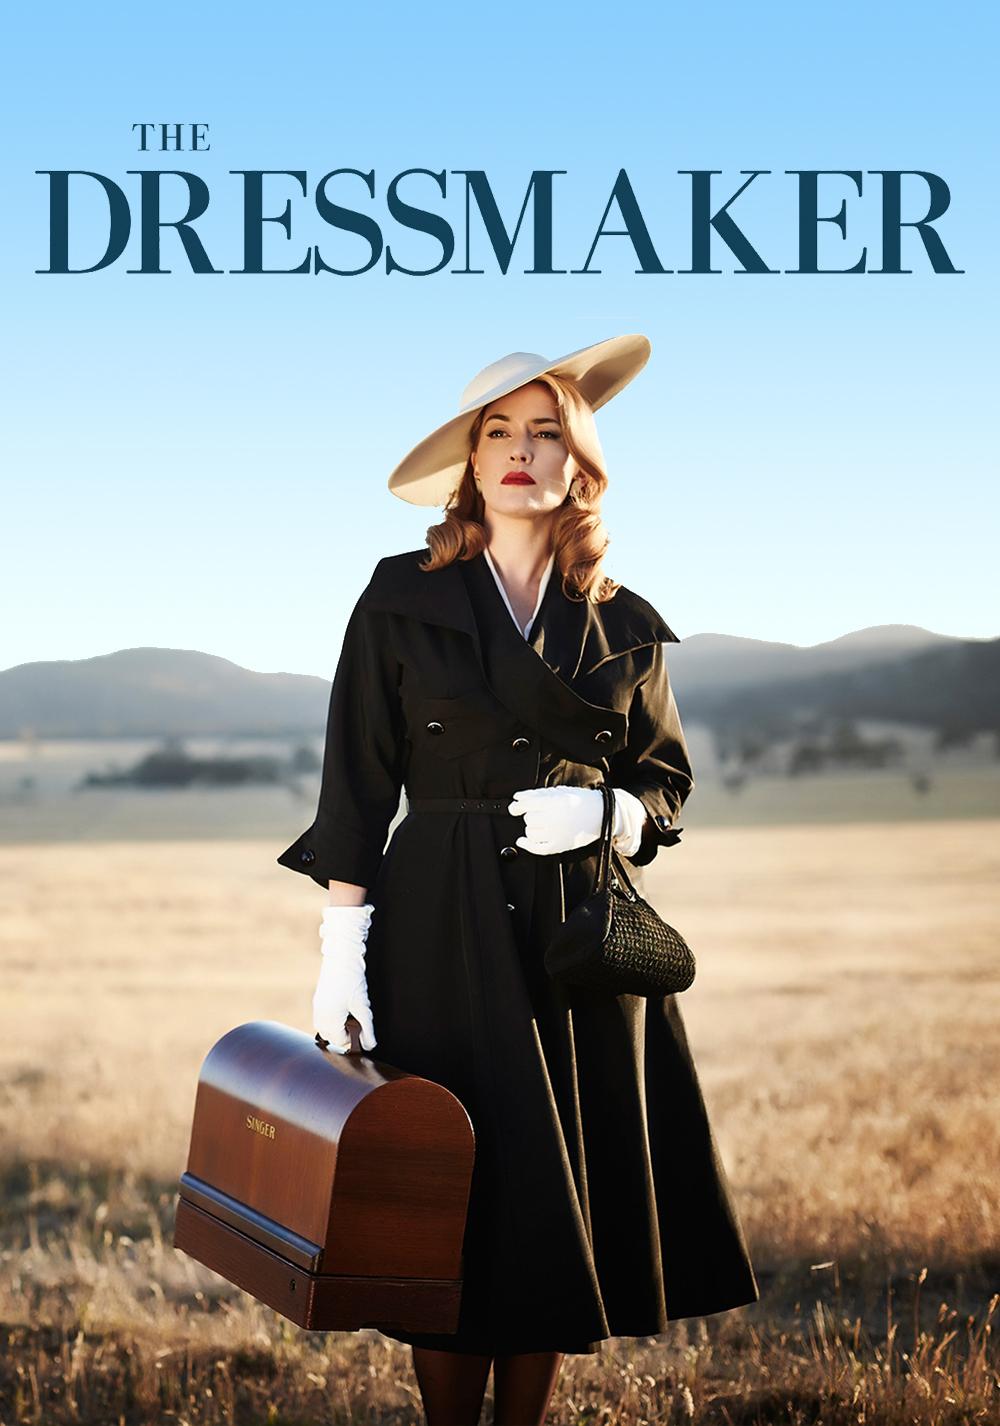 Dressmaker Film